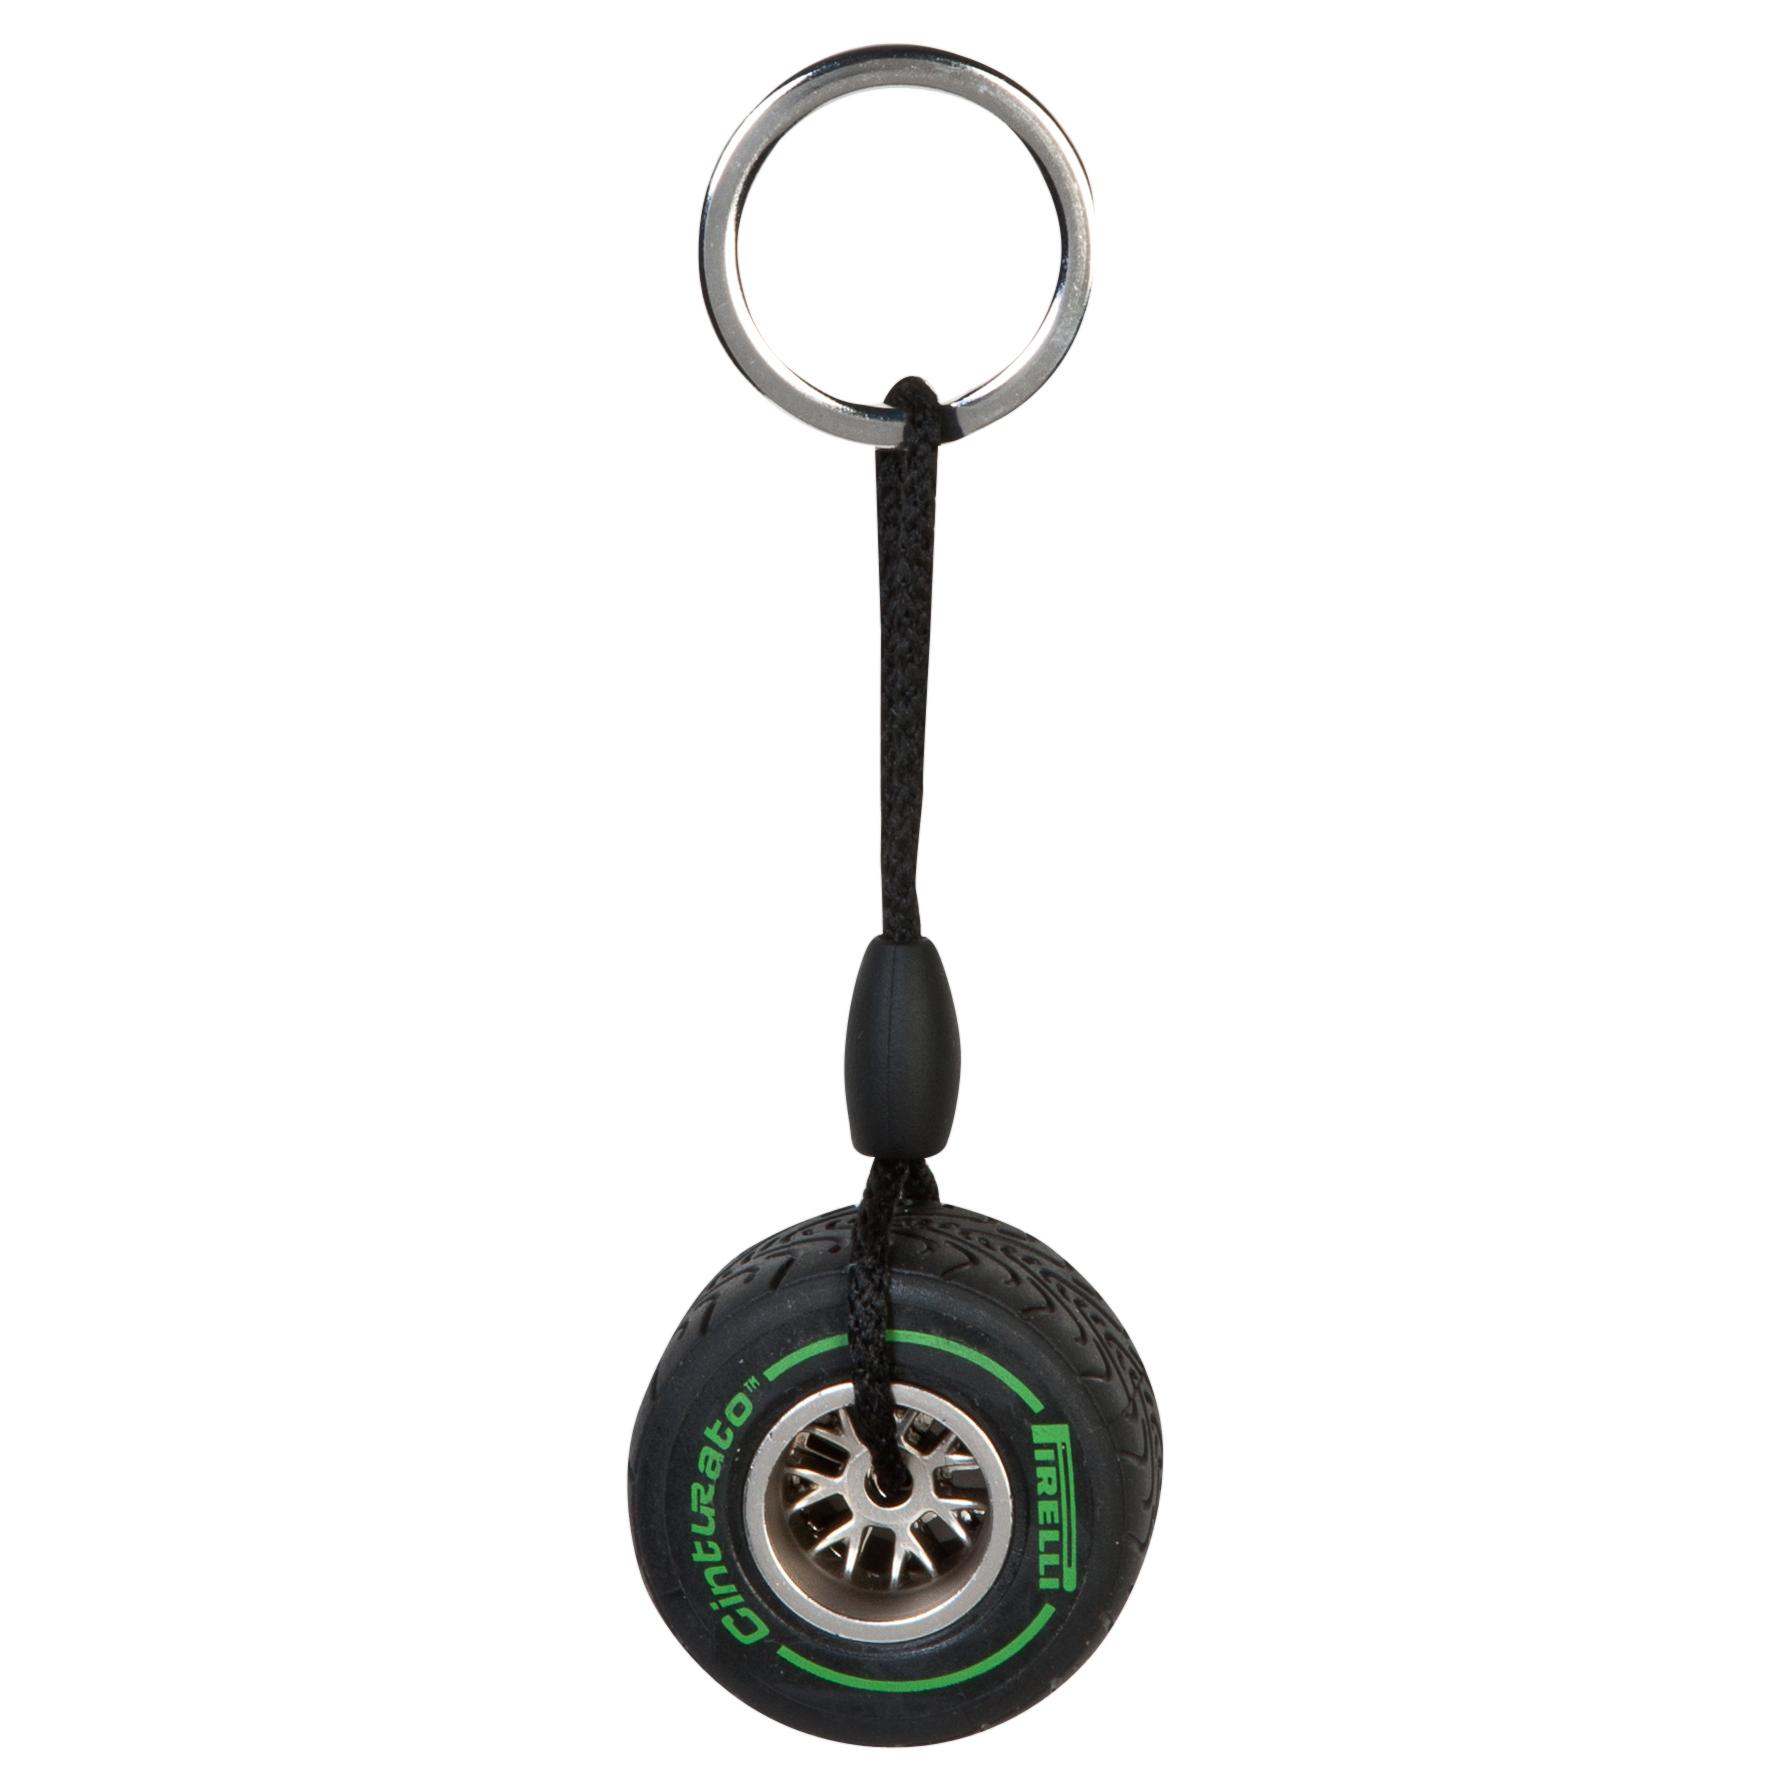 Pirelli Rim Tyre Key Ring - Intermediate Green